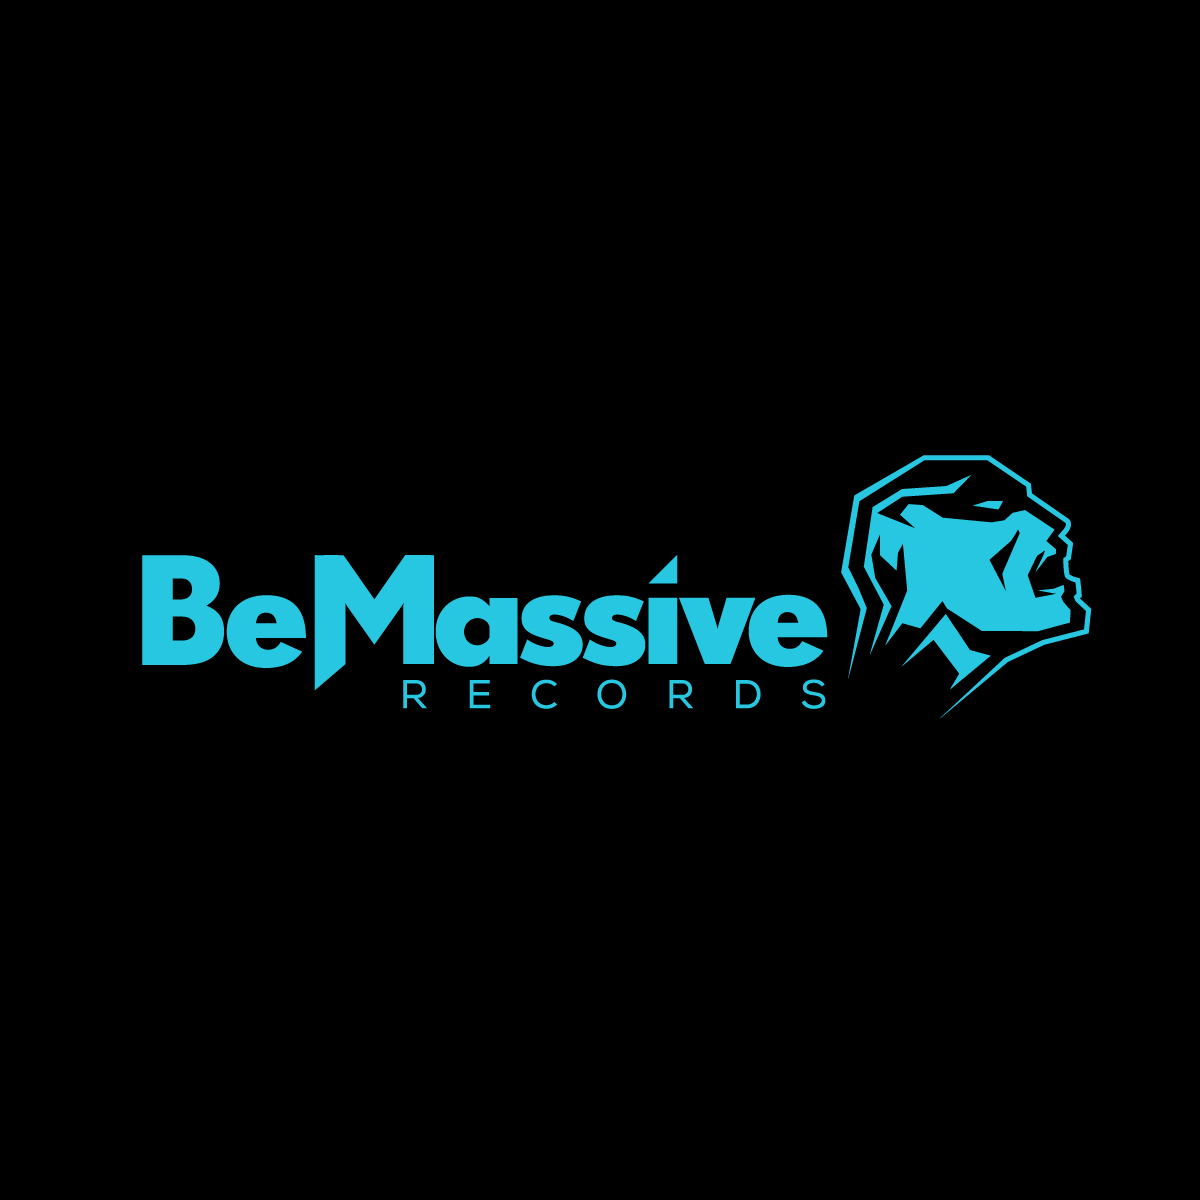 be_massive_logo1200x1200.jpg